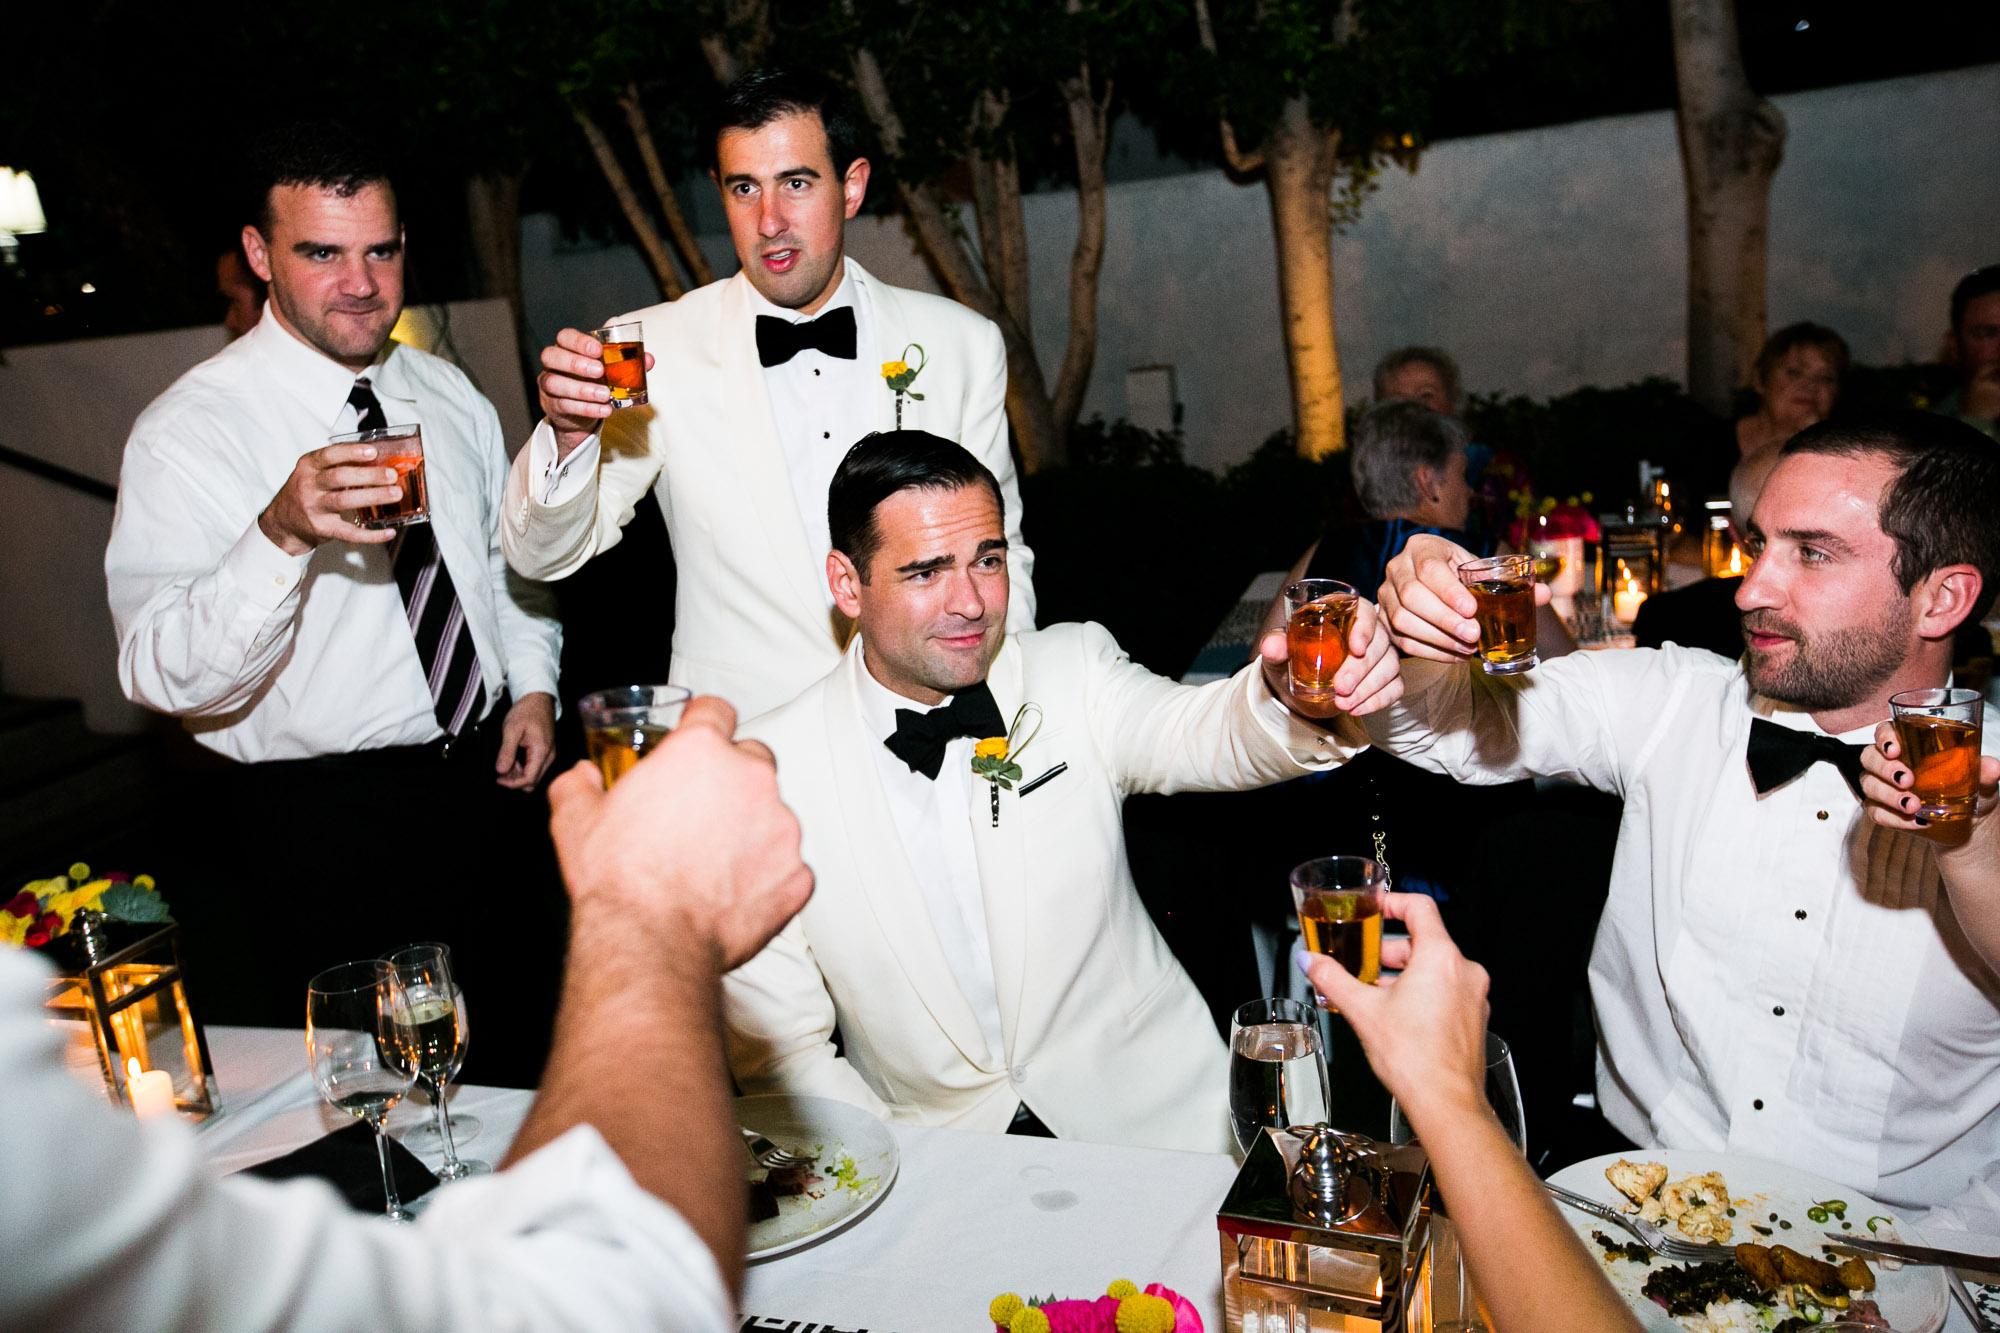 559-151025-Shane-Josh-Wedding-6758